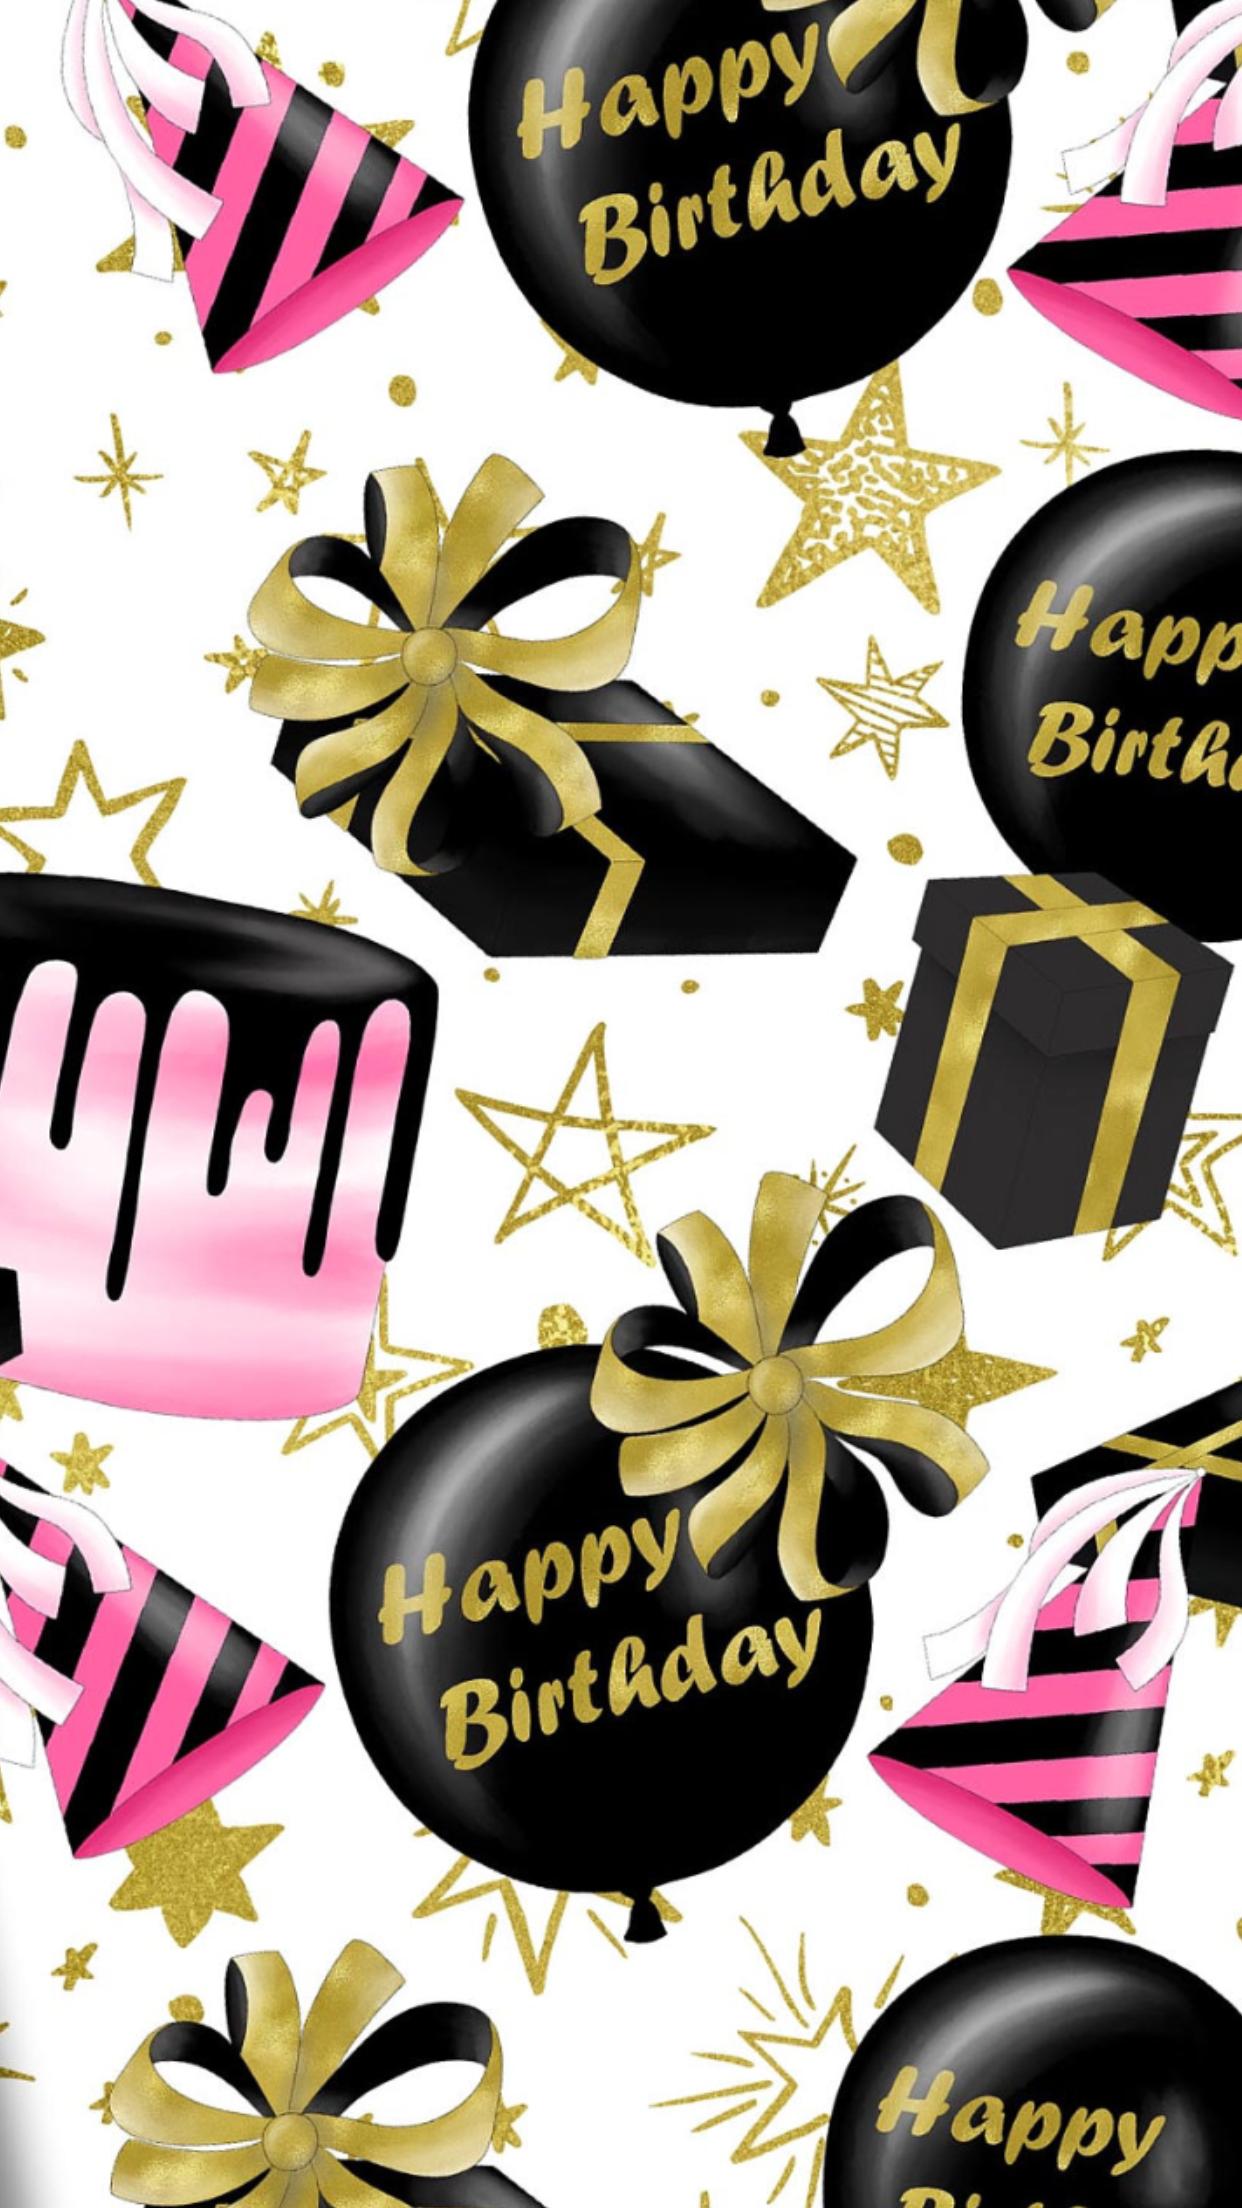 Happy Birthday Happybirthdayquotes Happy Birthday Greetings Free Happy Birthday Cards Happy Birthday Wishes Cards